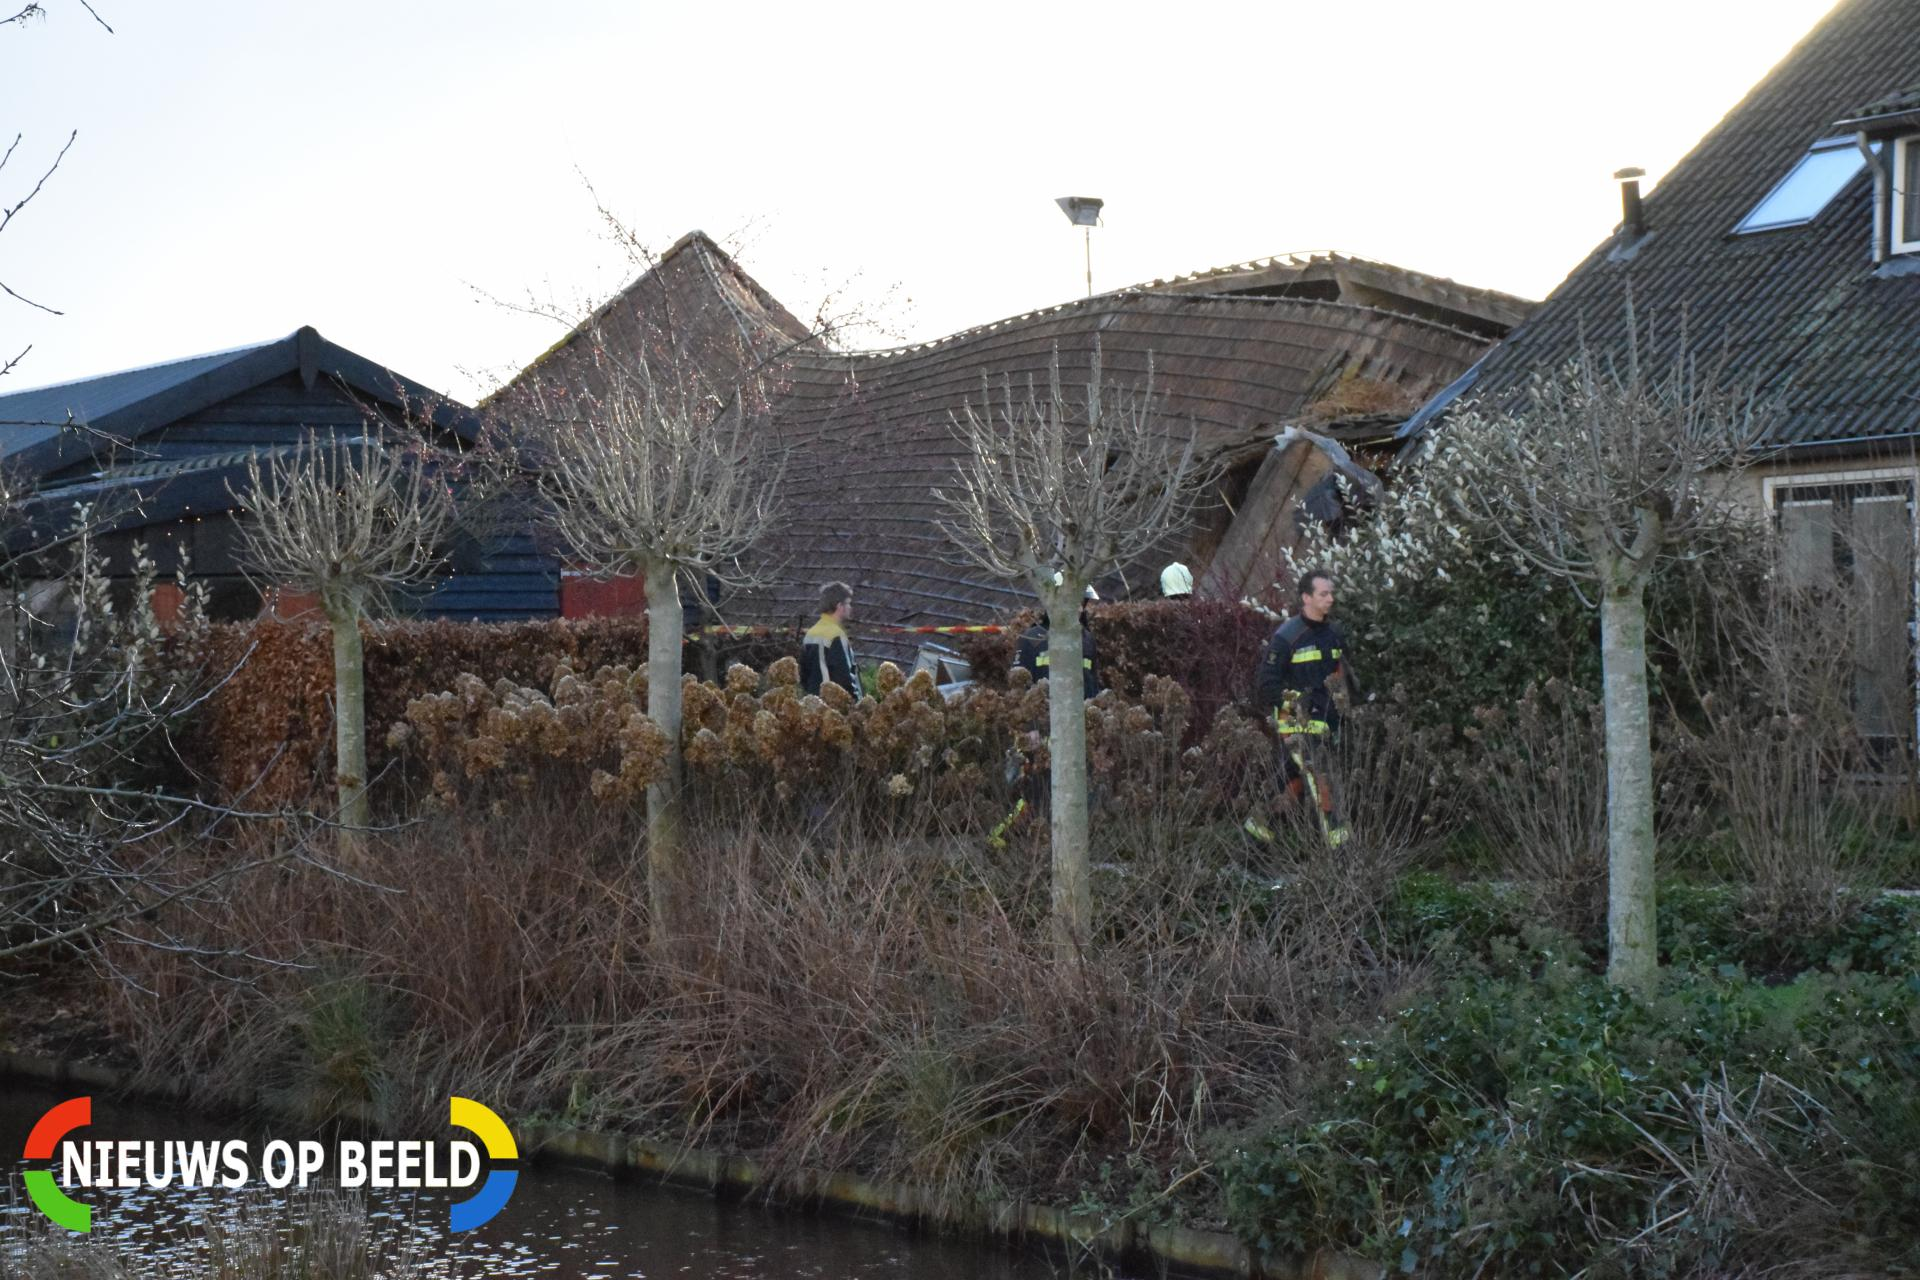 Man gewond bij instorting dak schuur Benedenberg Bergambacht